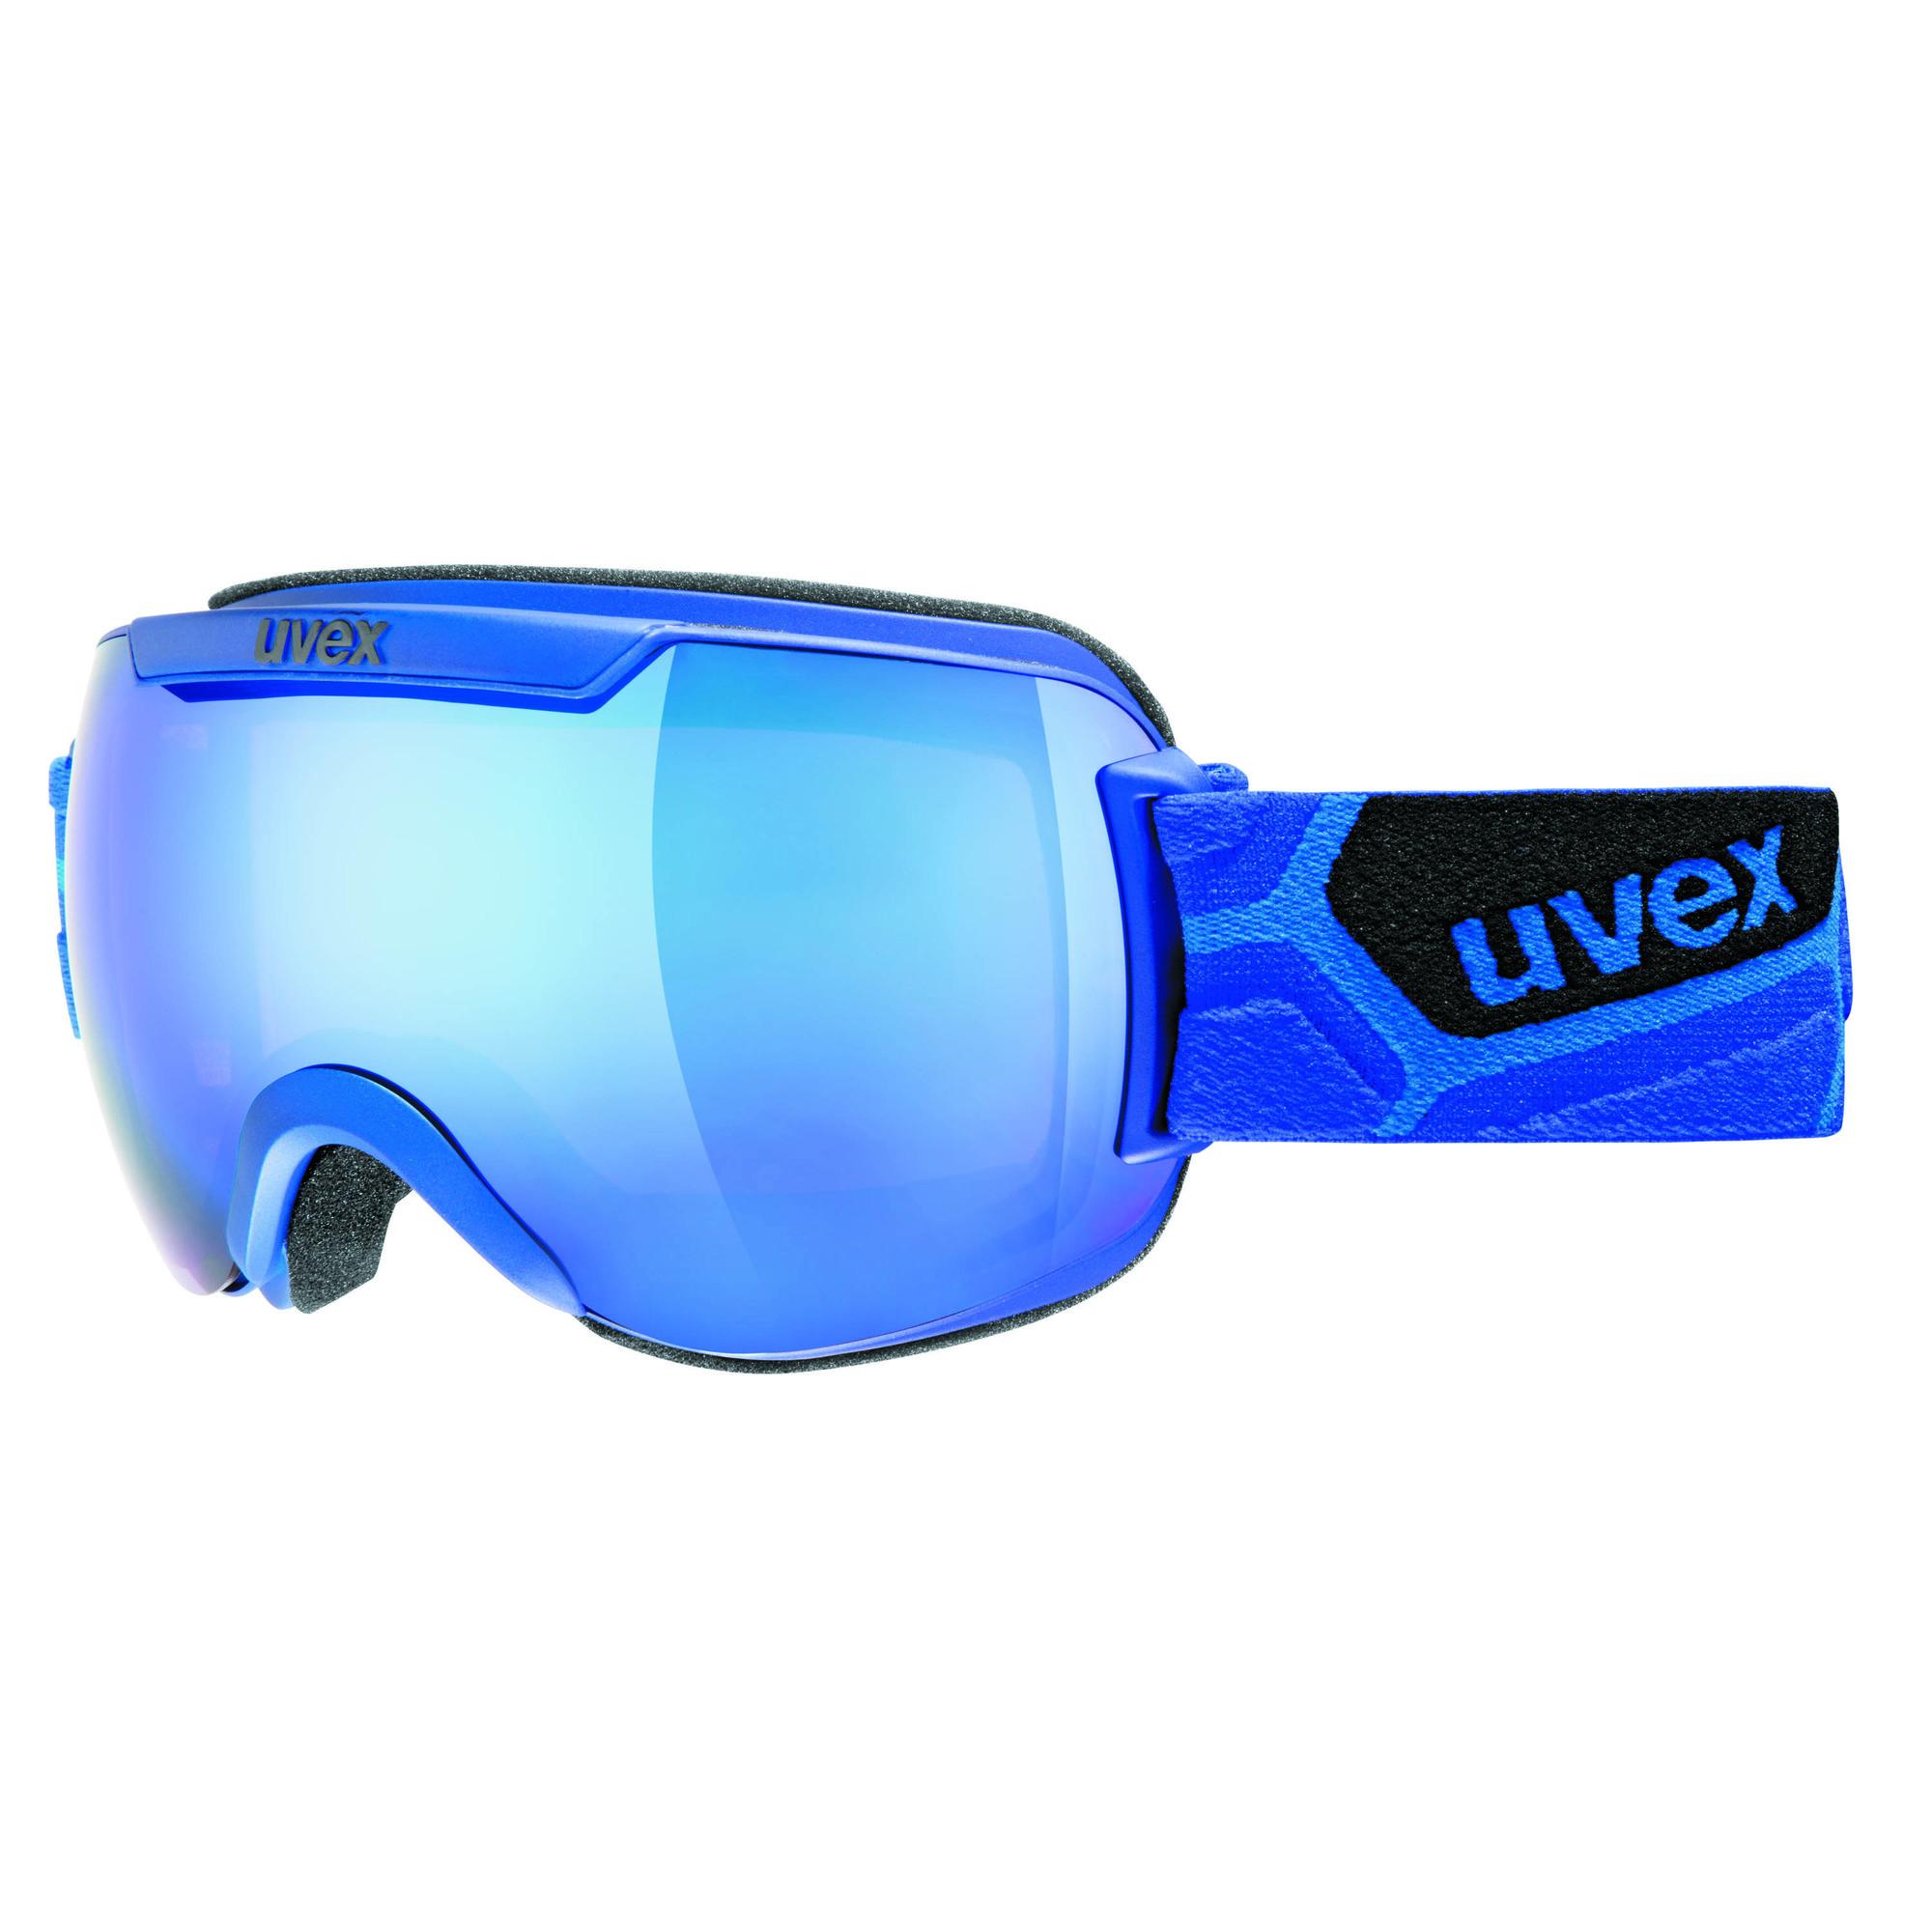 Uvex Ski Goggles